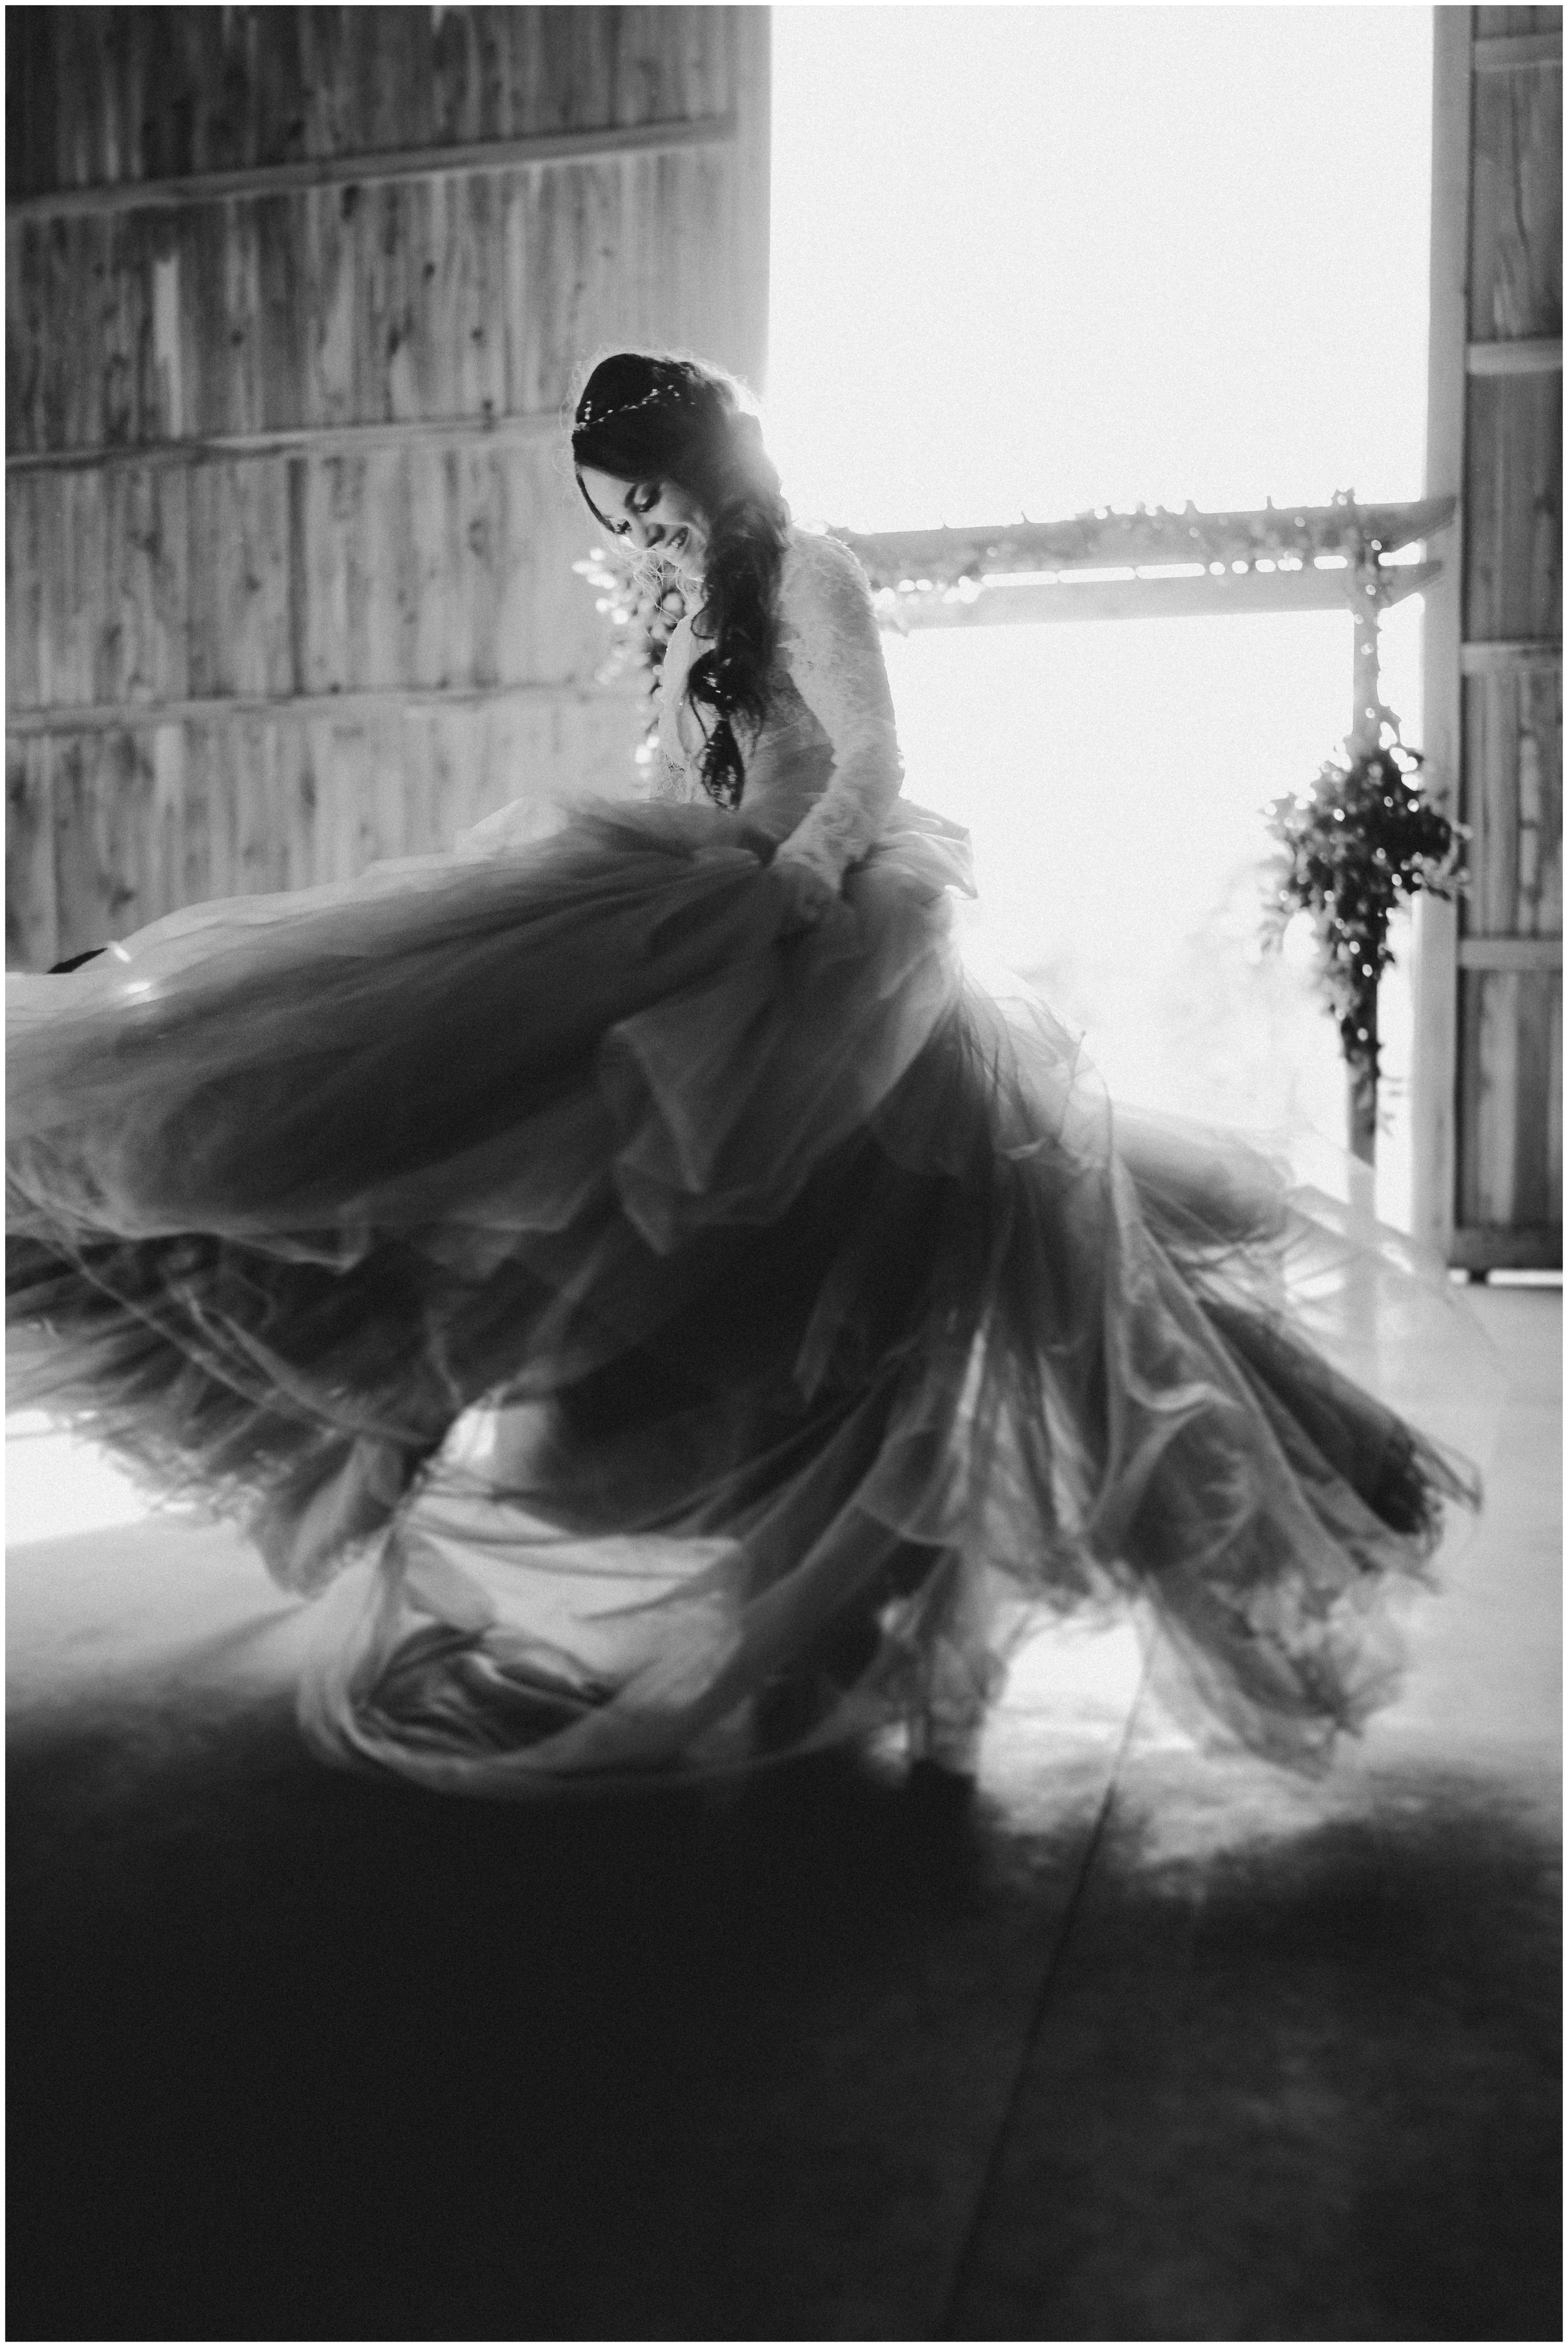 TONY-GAMBINO-PHOTOGRAPHY-BEND-OREGON-WEDDING-SHOOT-000_1542 bride spinning dress.jpg